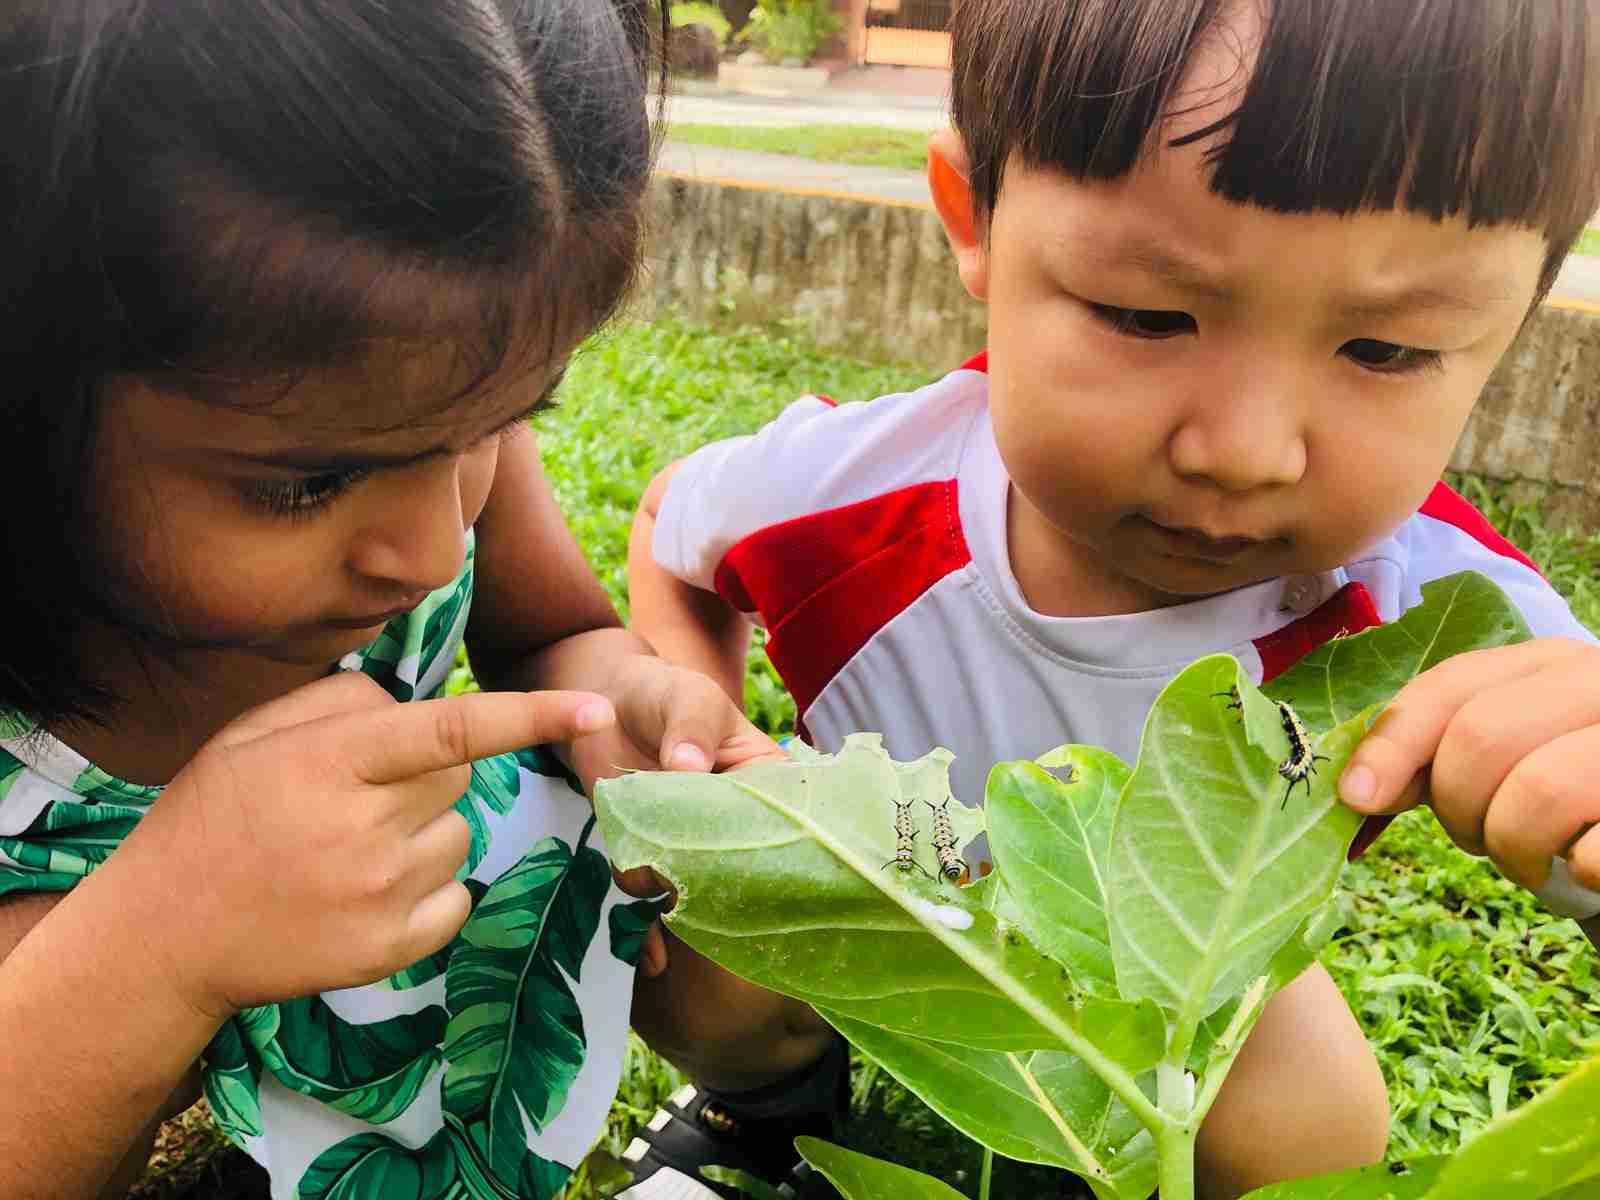 toddlers examining caterpillars